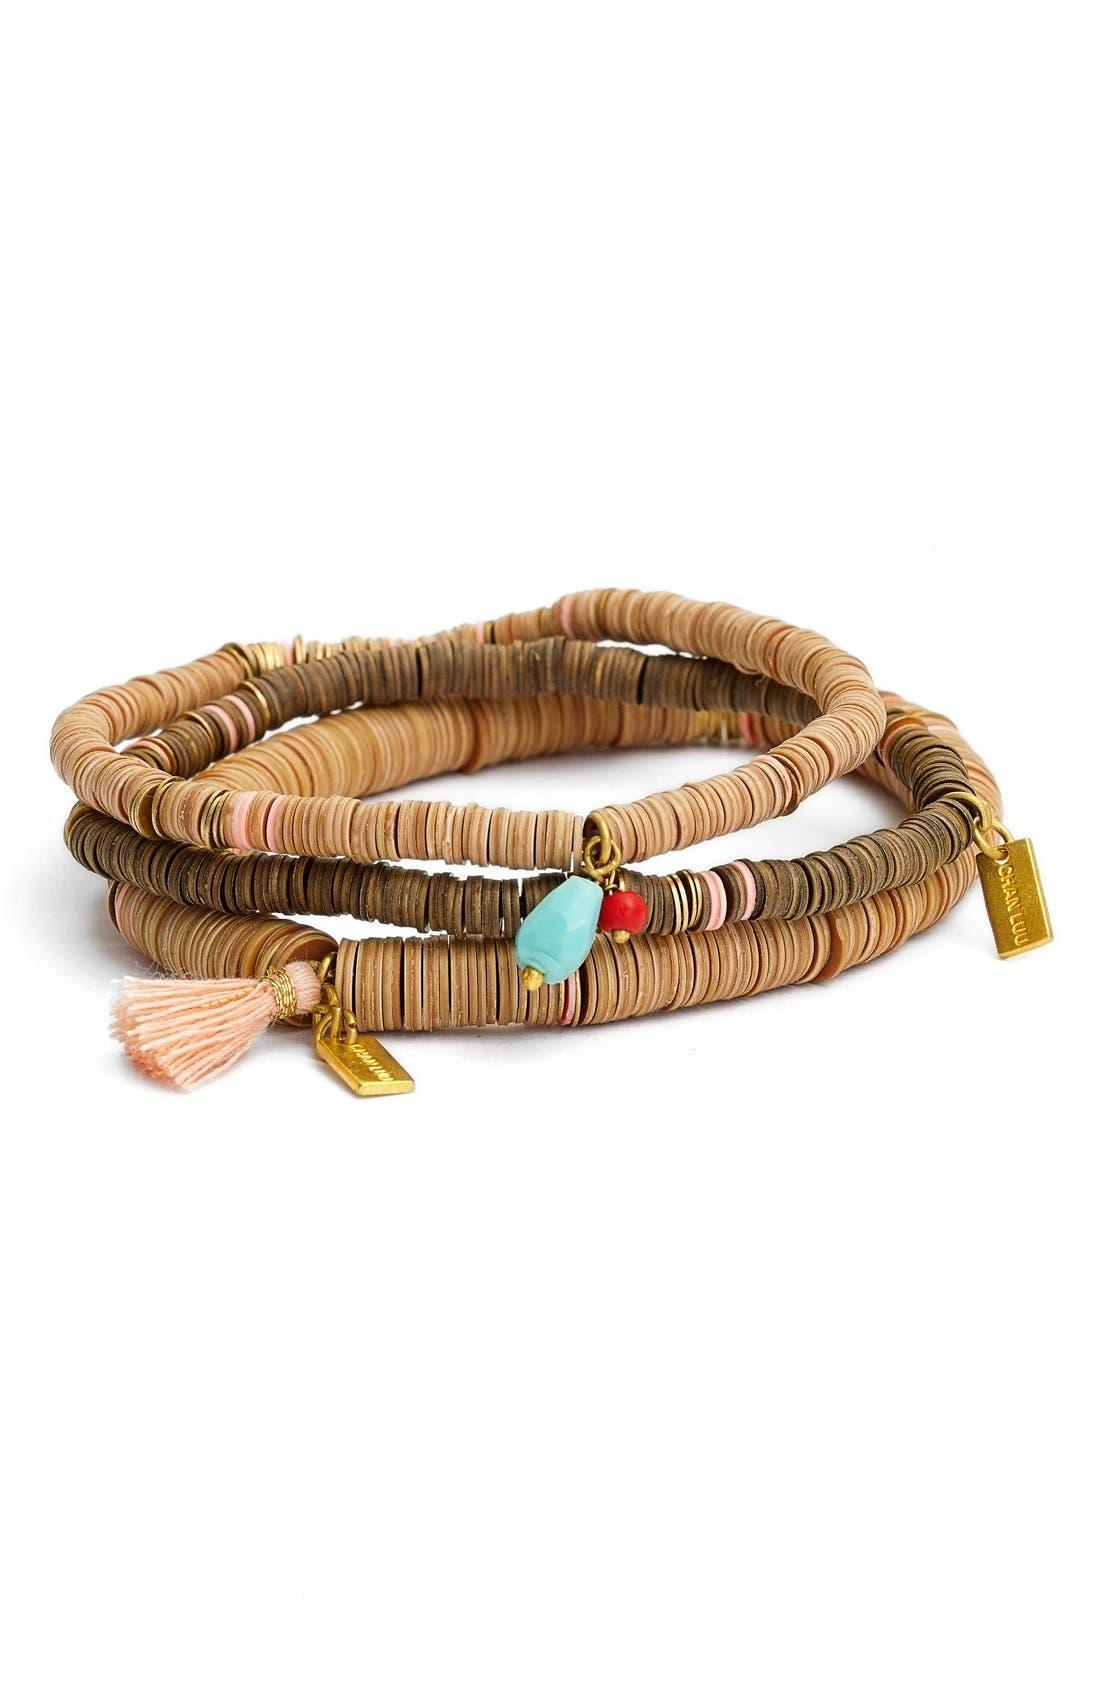 Alternate Image 1 Selected - Chan Luu Bead Stretch Bracelets (Set of 3)